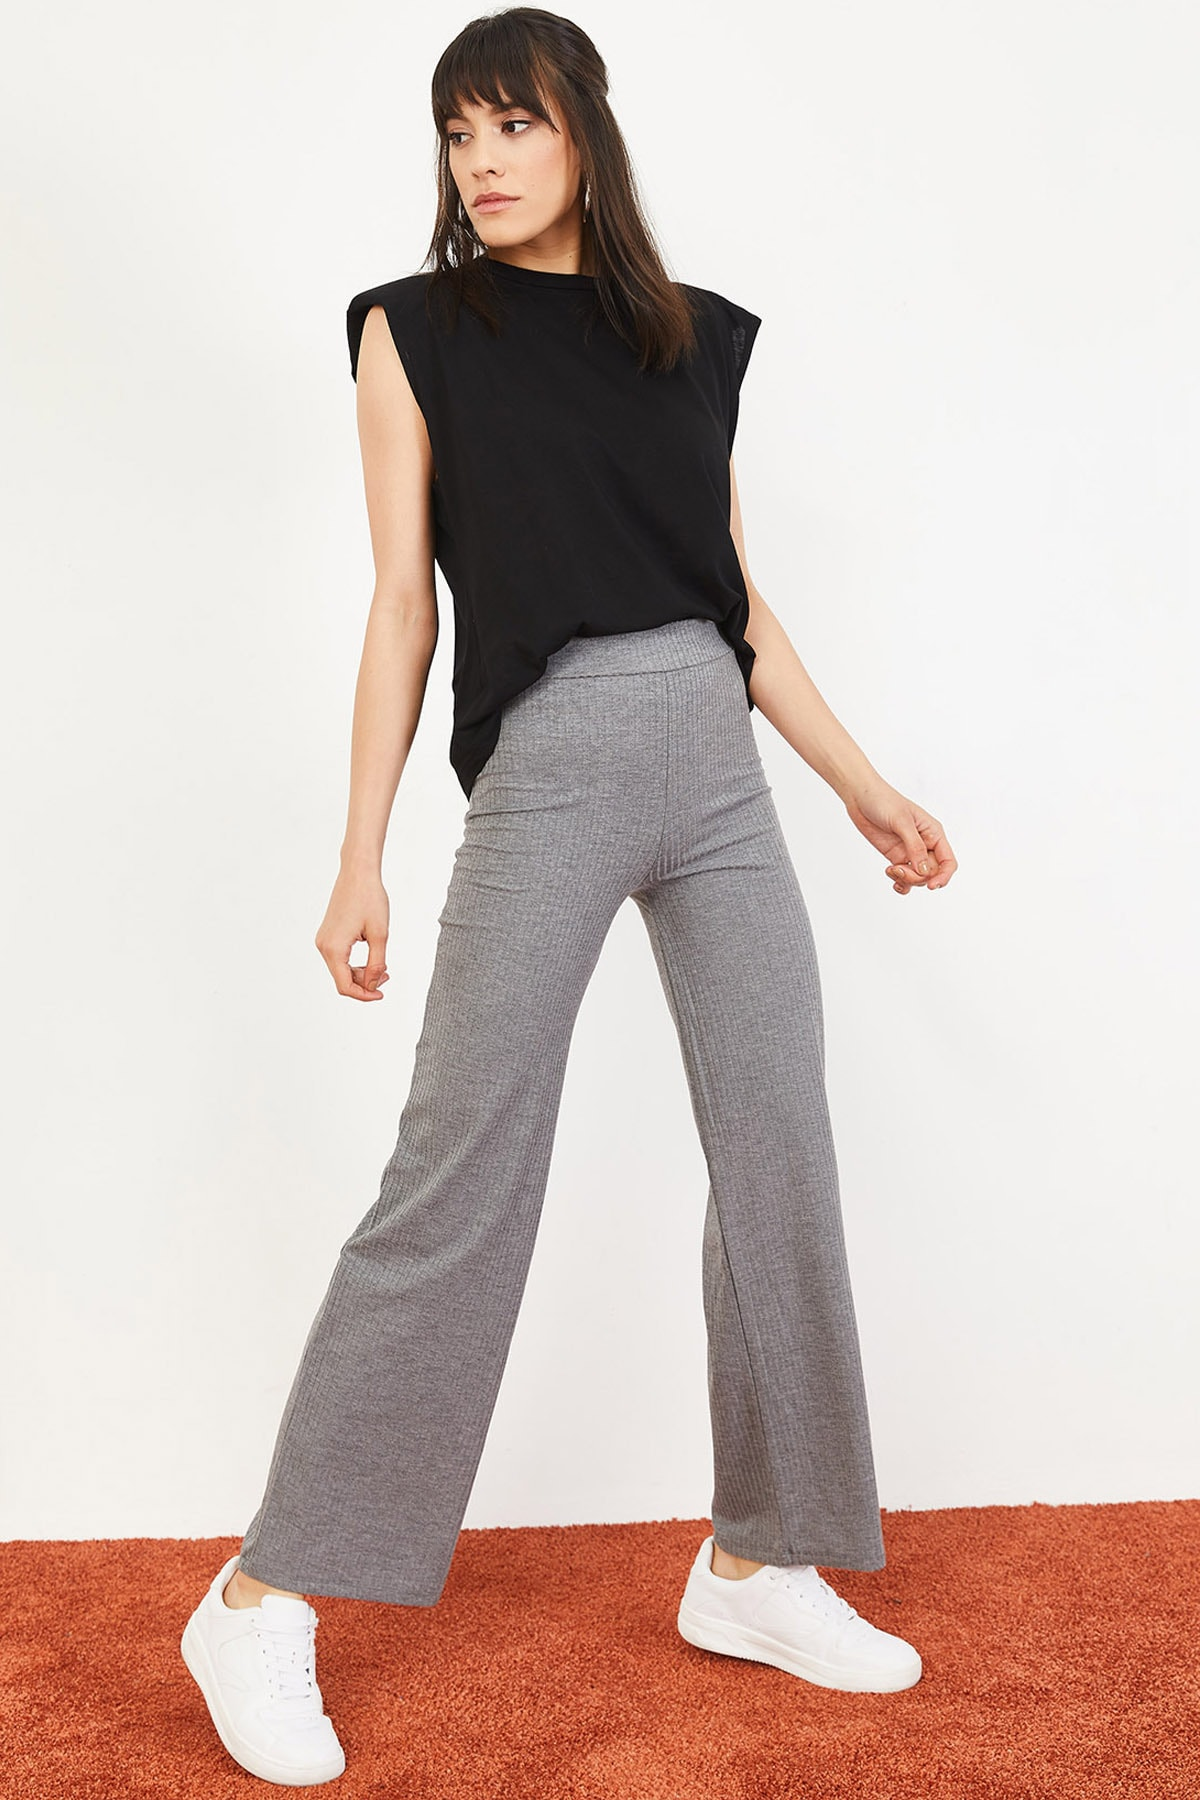 Bianco Lucci Kadın Gri İspanyol Paça Beli Lastikli Rahat Pantolon 10051020 0